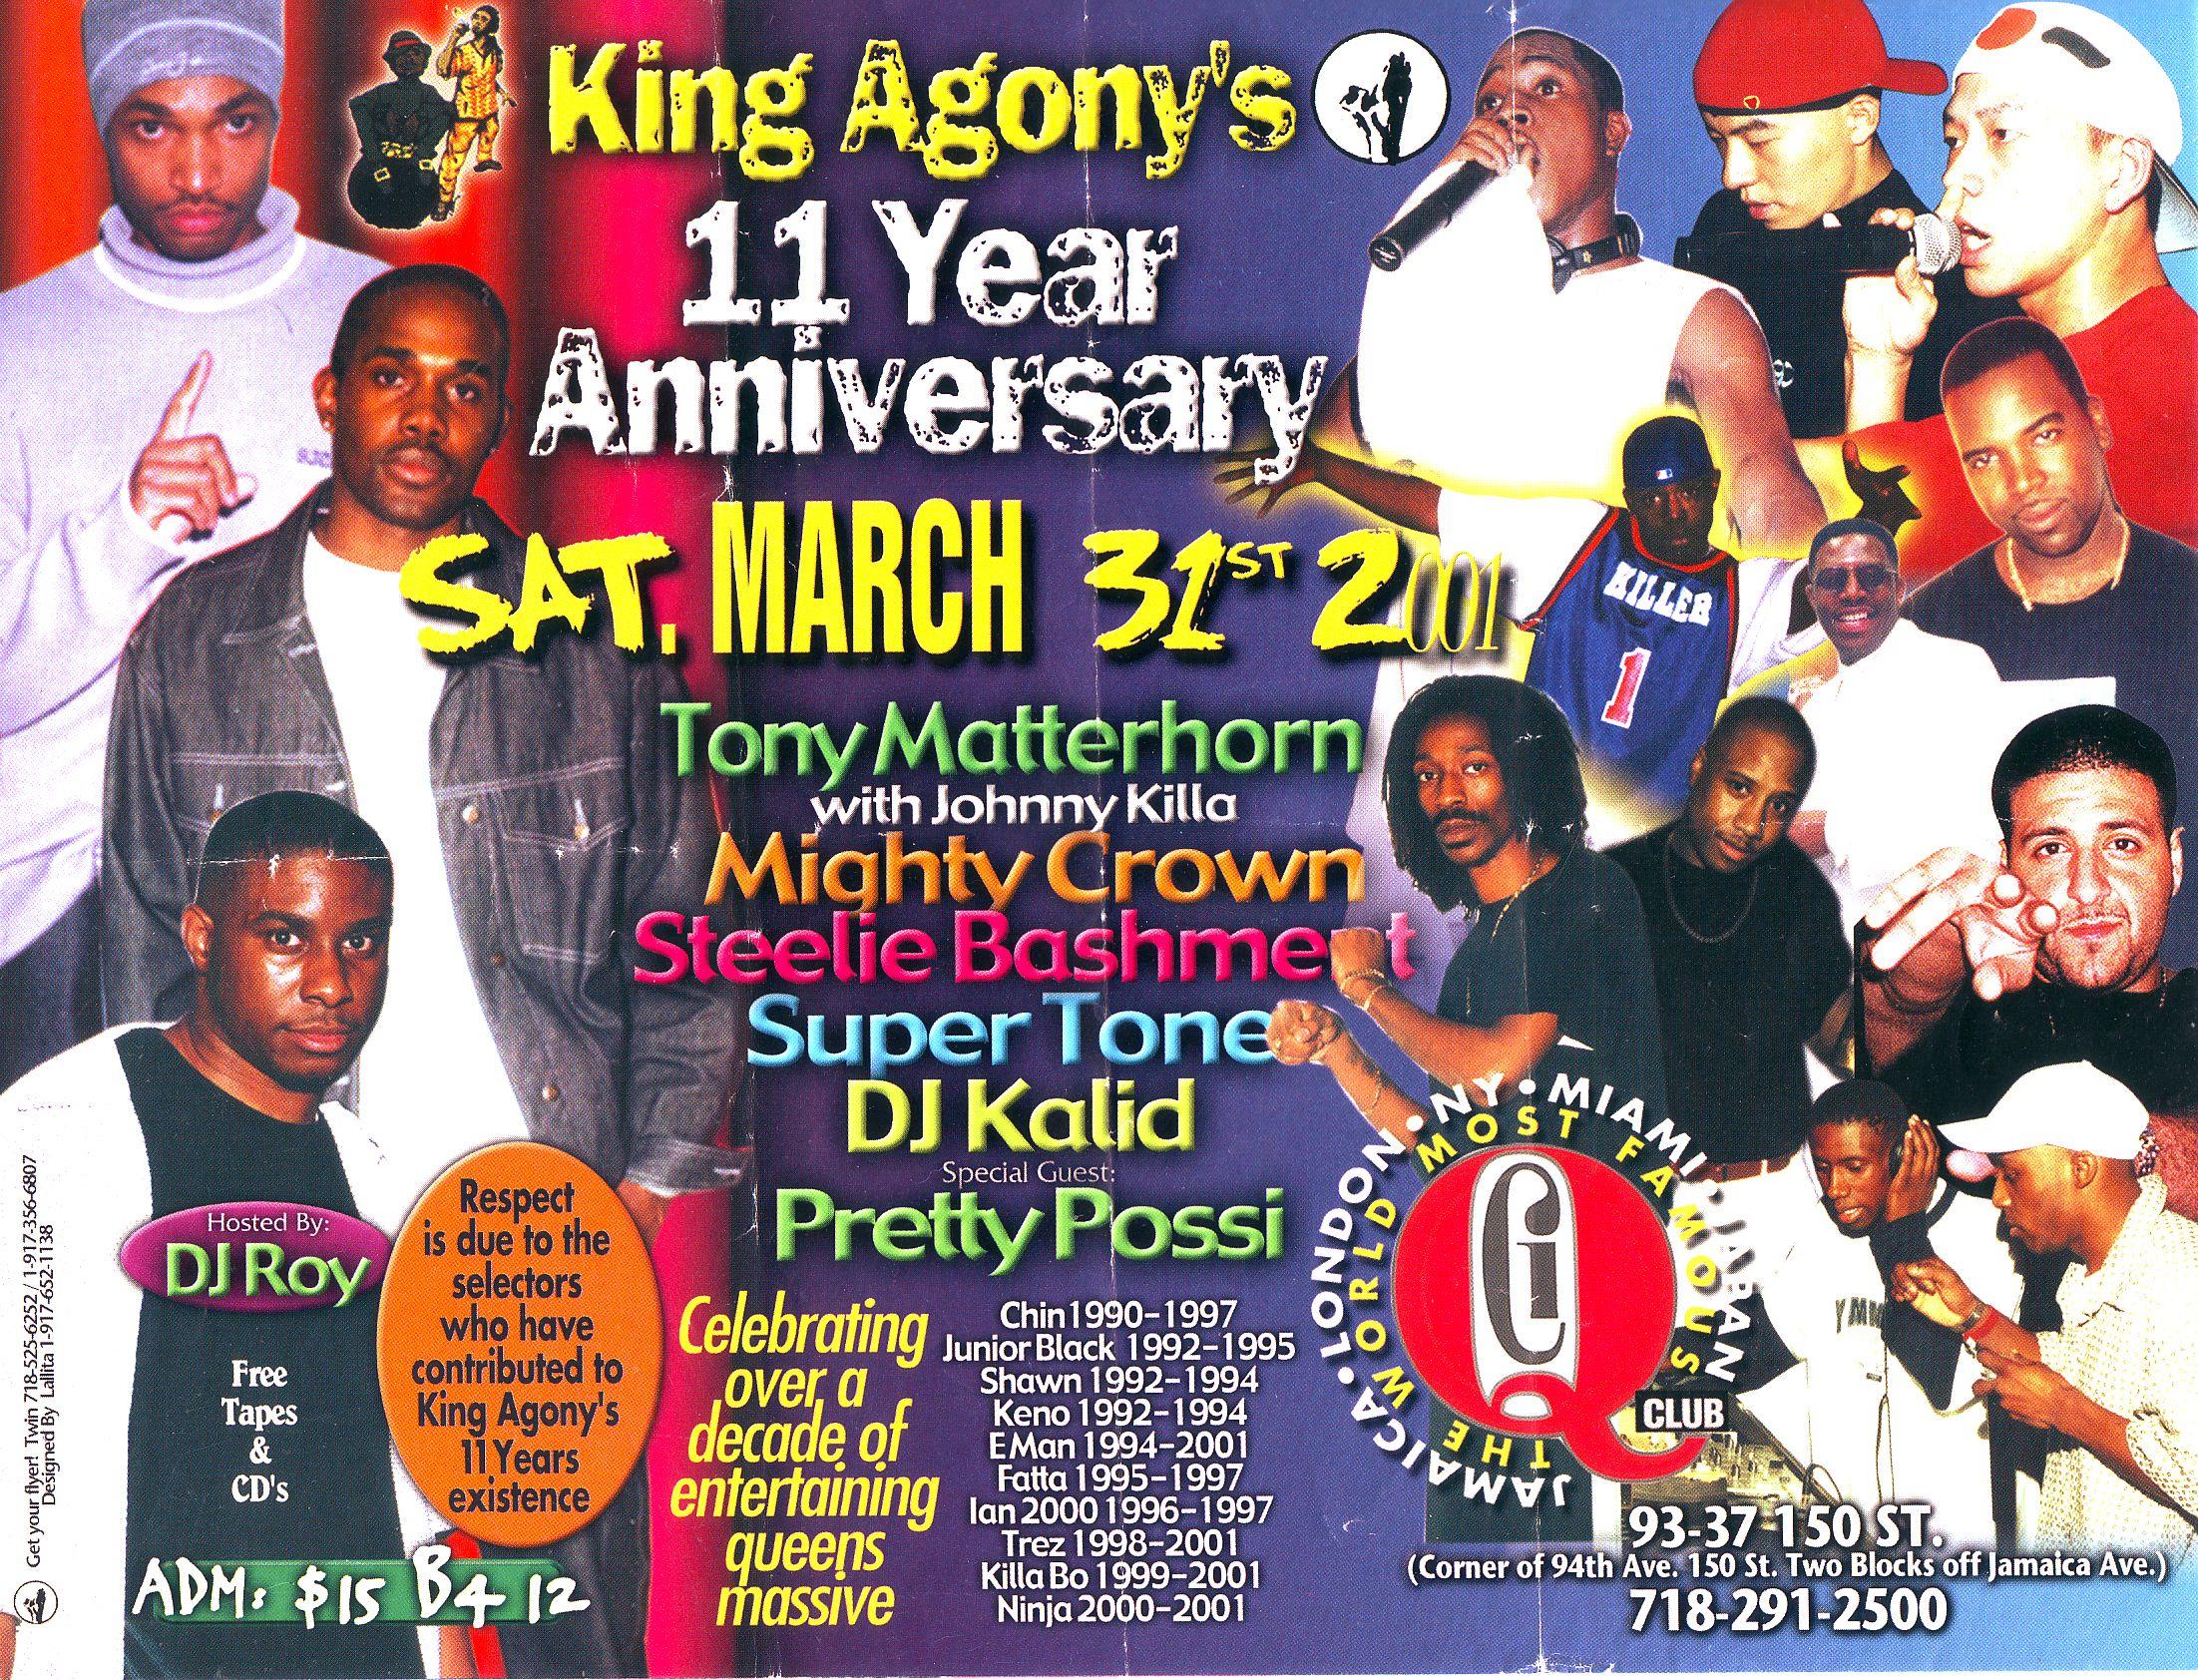 King Agony 11 Year Anniversary